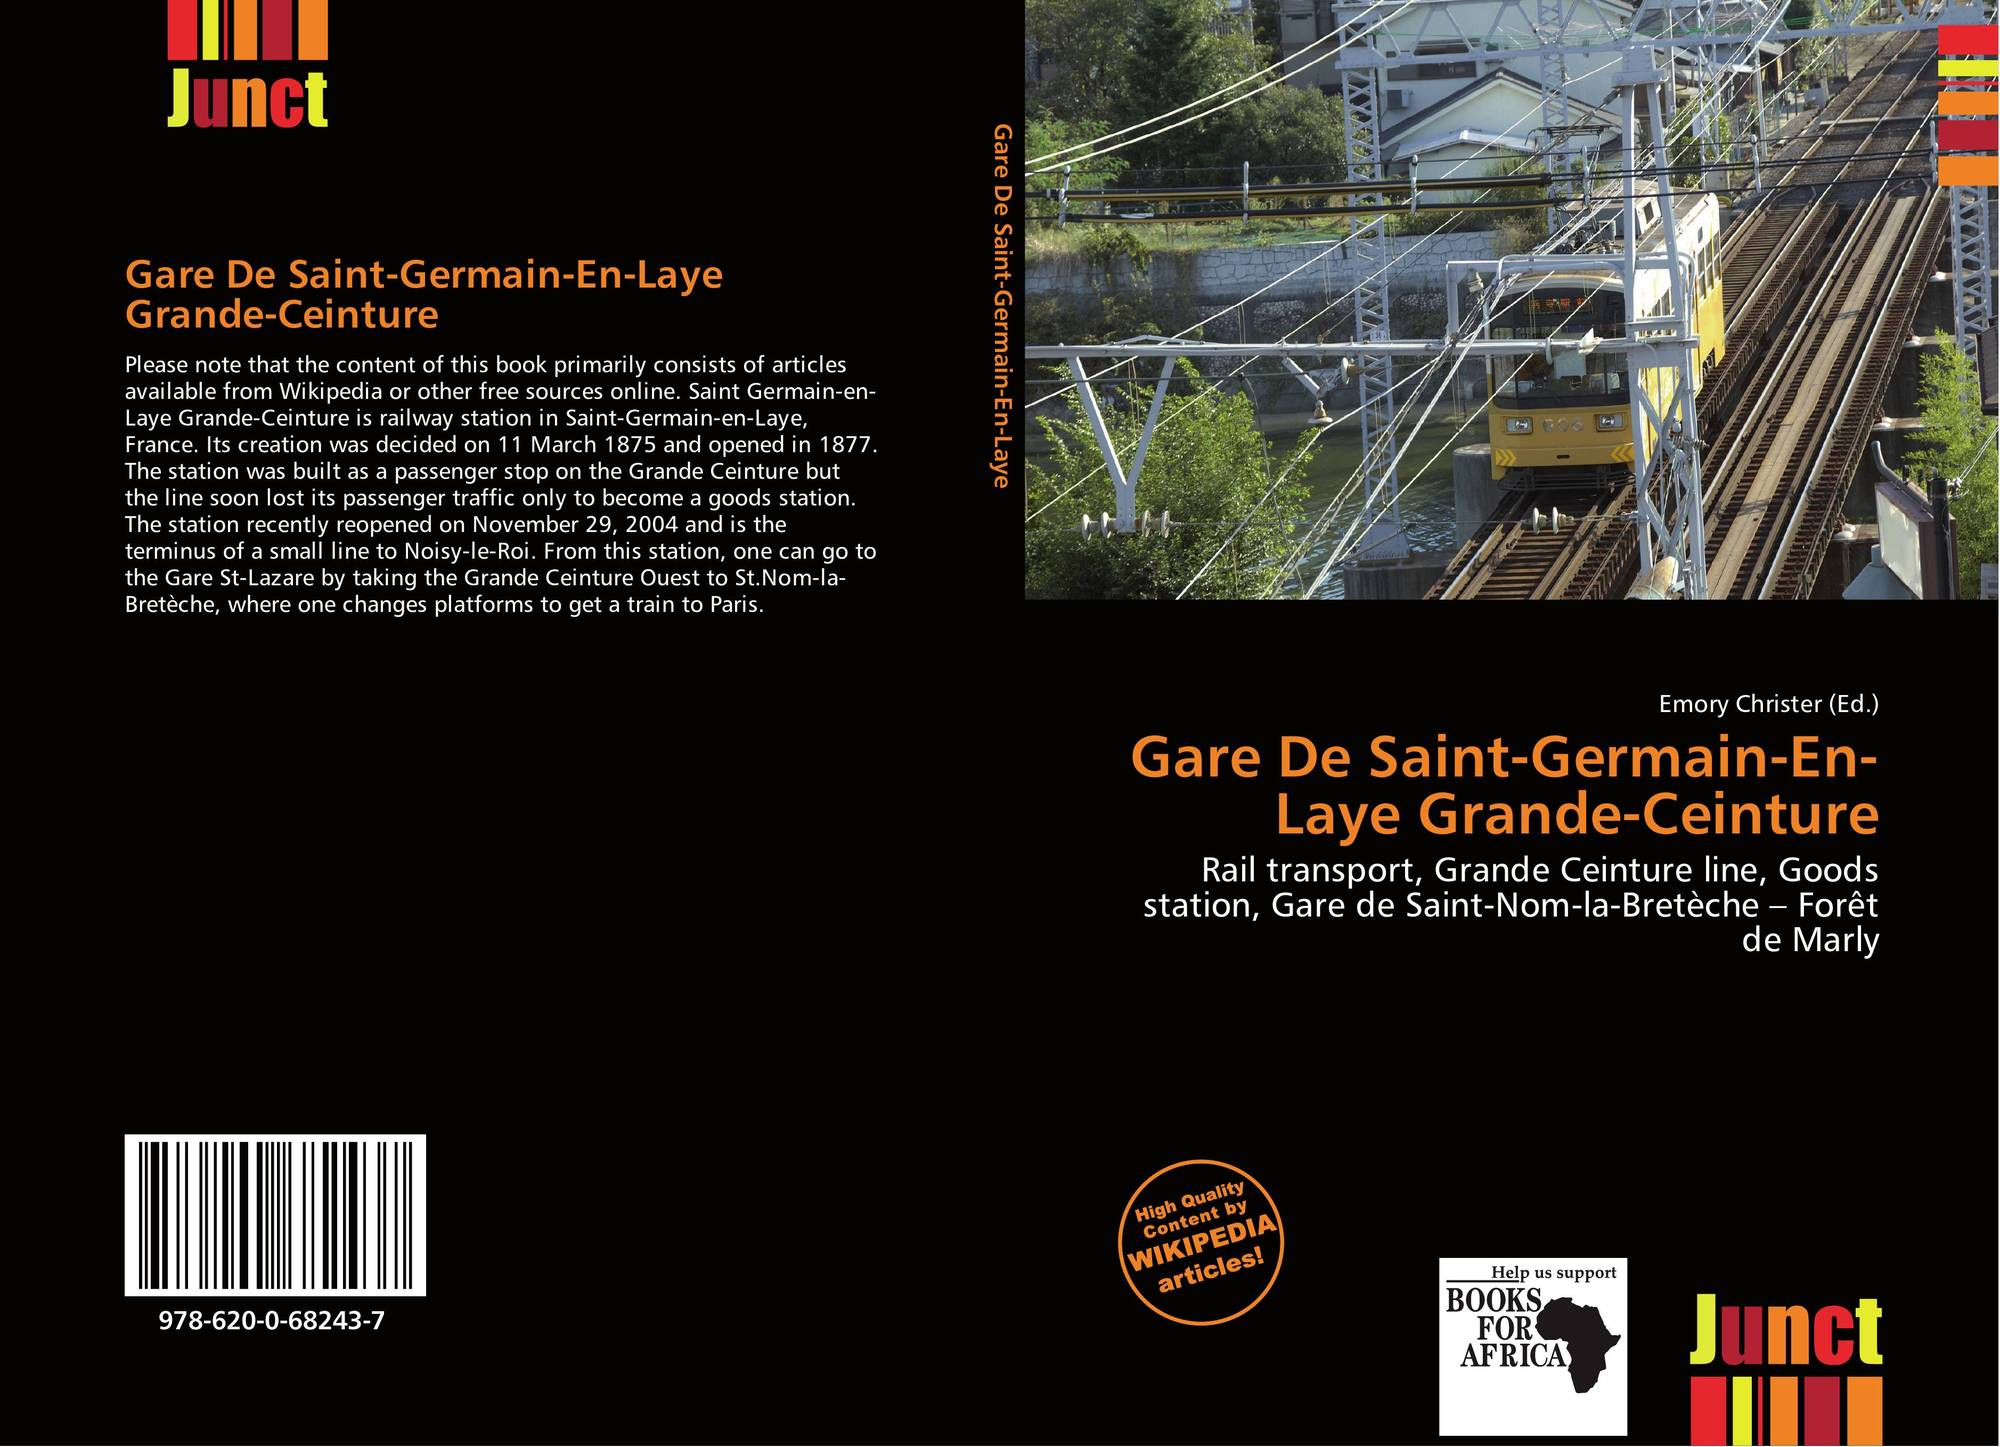 Gare de saint germain en laye grande ceinture 978 620 0 68243 7 6200682437 9786200682437 - Bureau de change st germain en laye ...